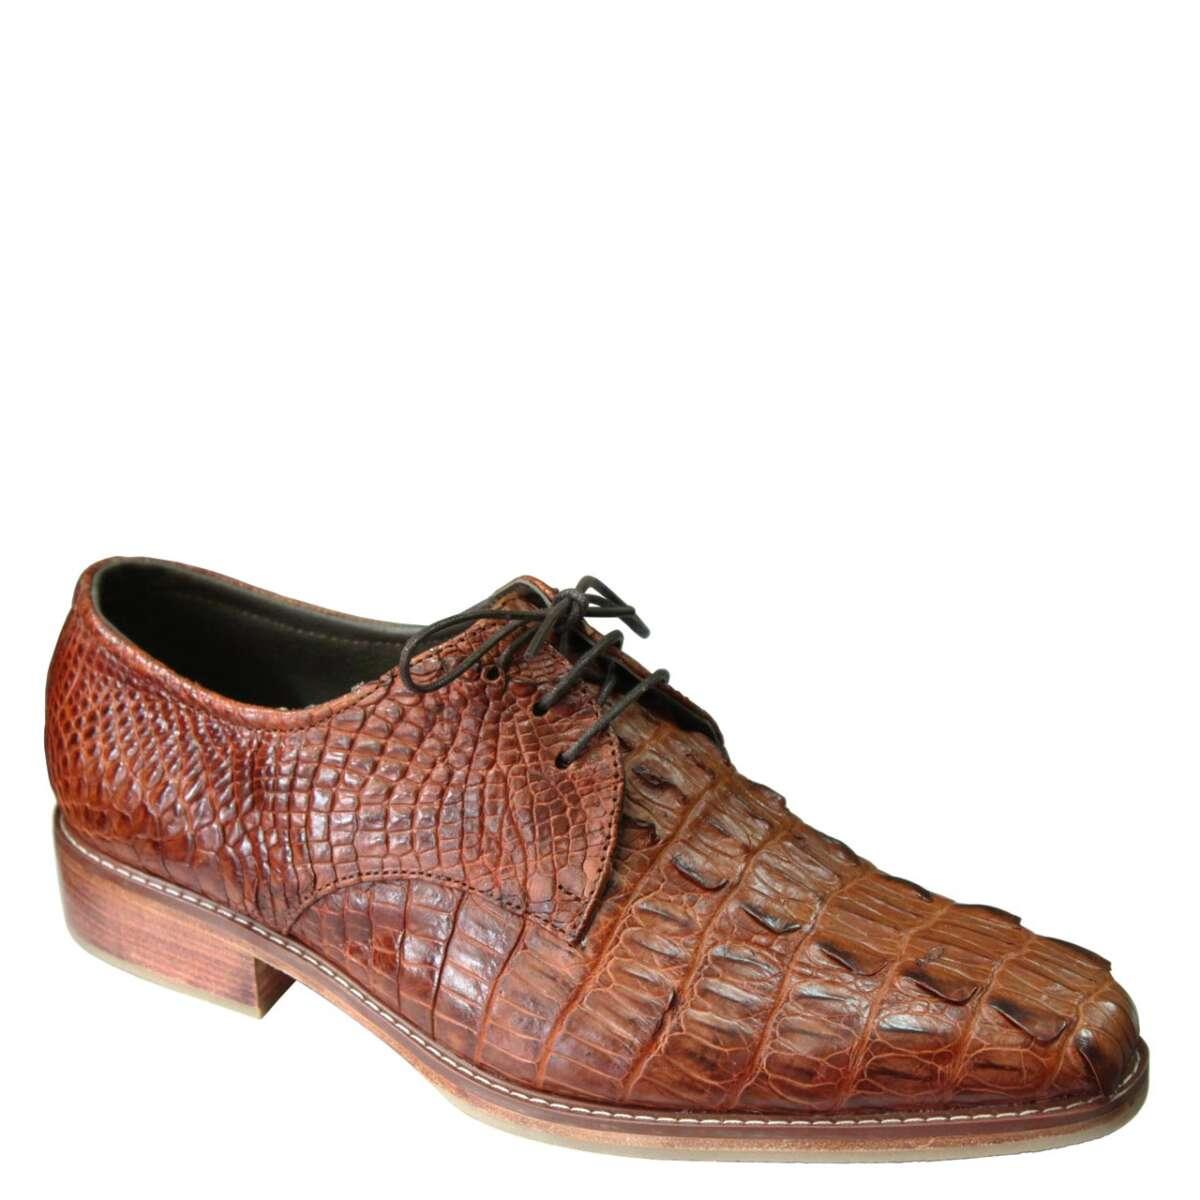 Giày nam da cá sấu S855a